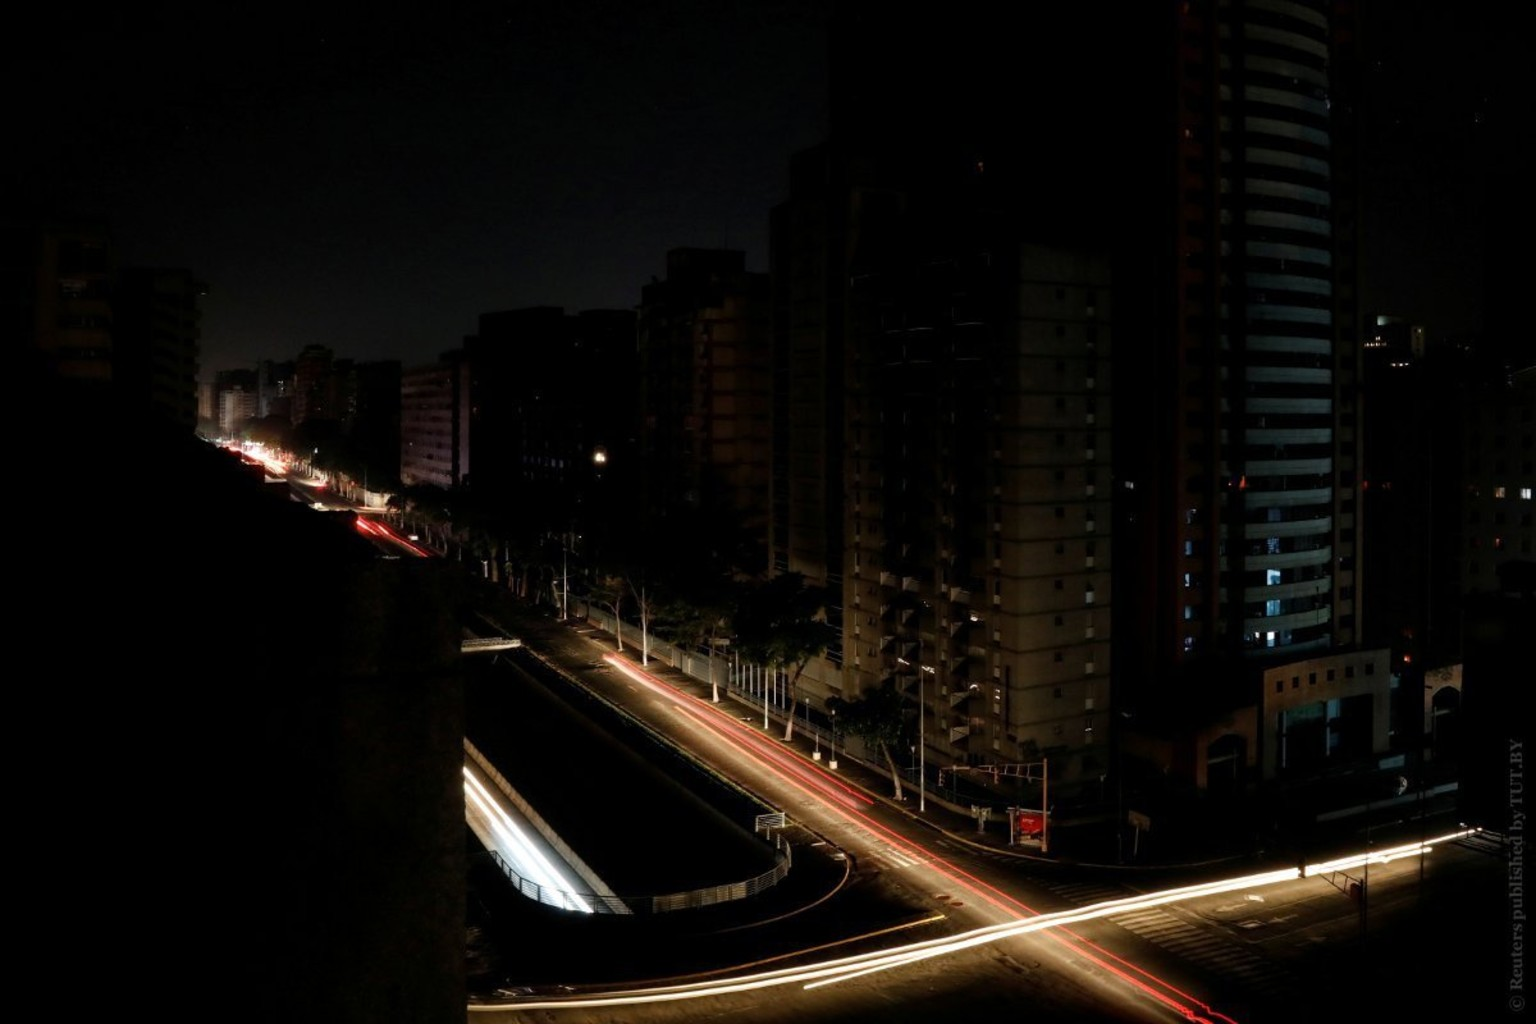 Venesuela svet blekaut 032019